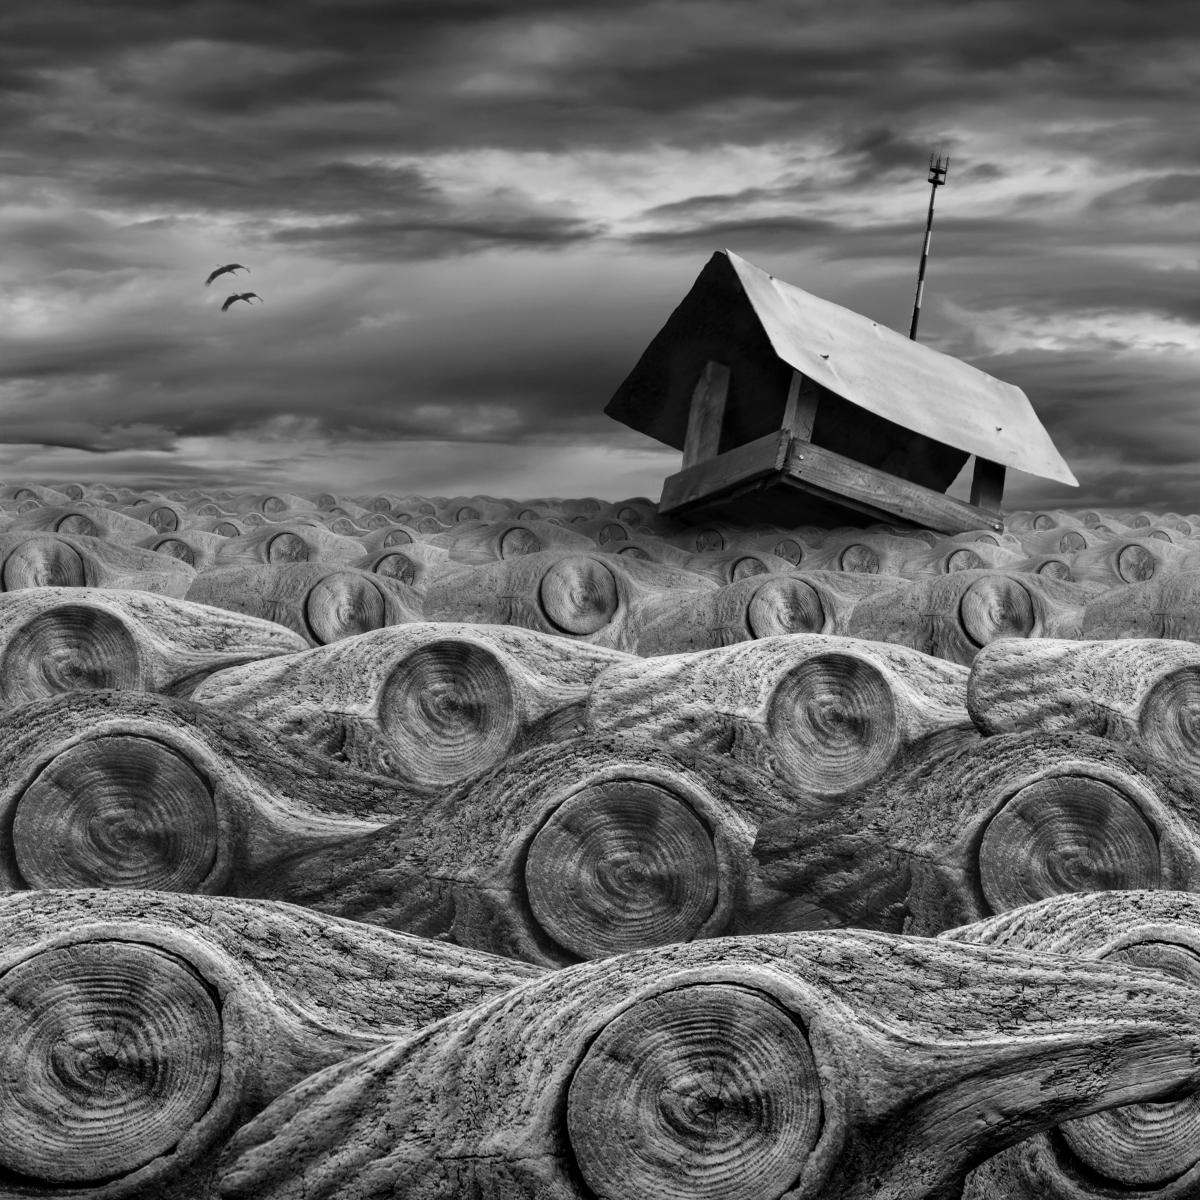 Dariusz Klimczak fotograf, fotografia, surrealizm, fotomontaż, fotografia kreatywna, niezła sztuka